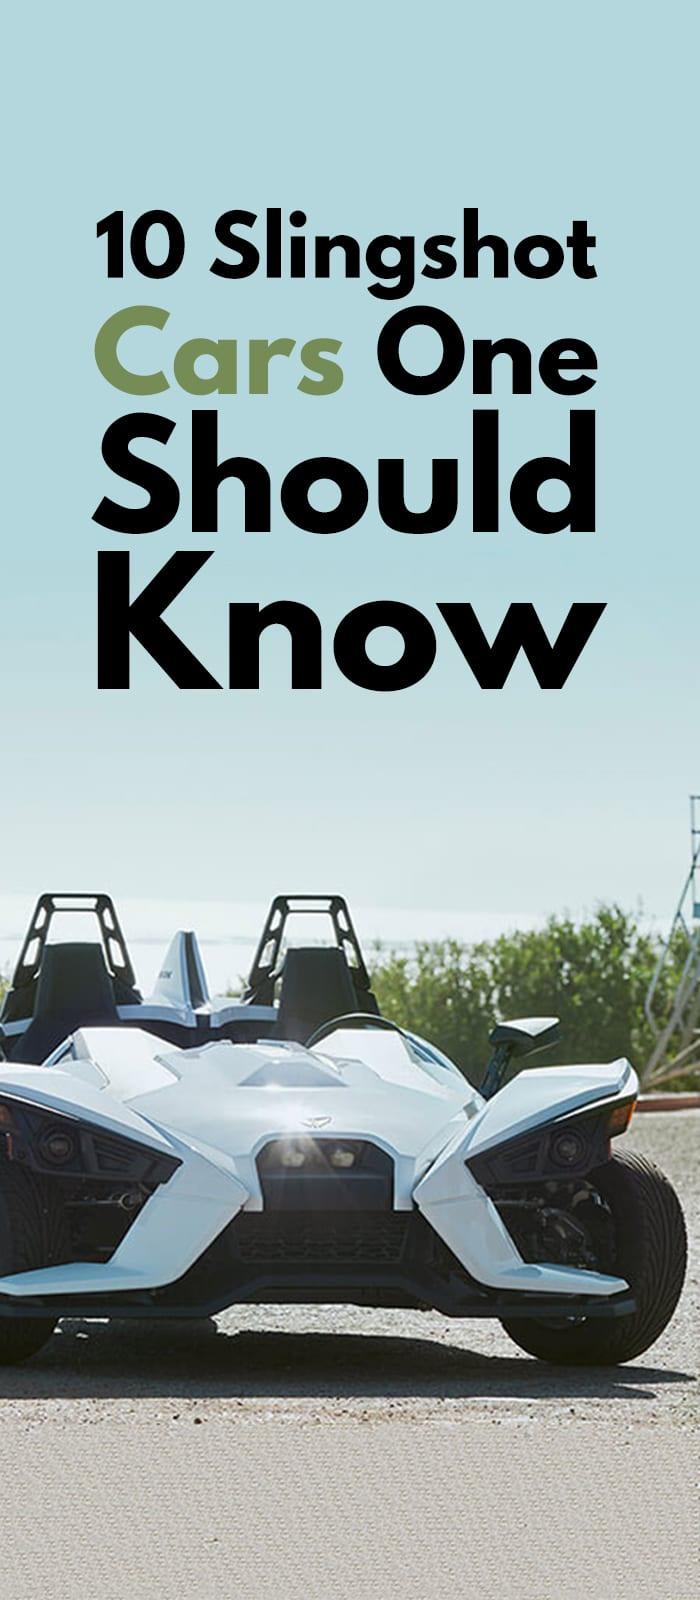 Slingshot Cars One Should Know